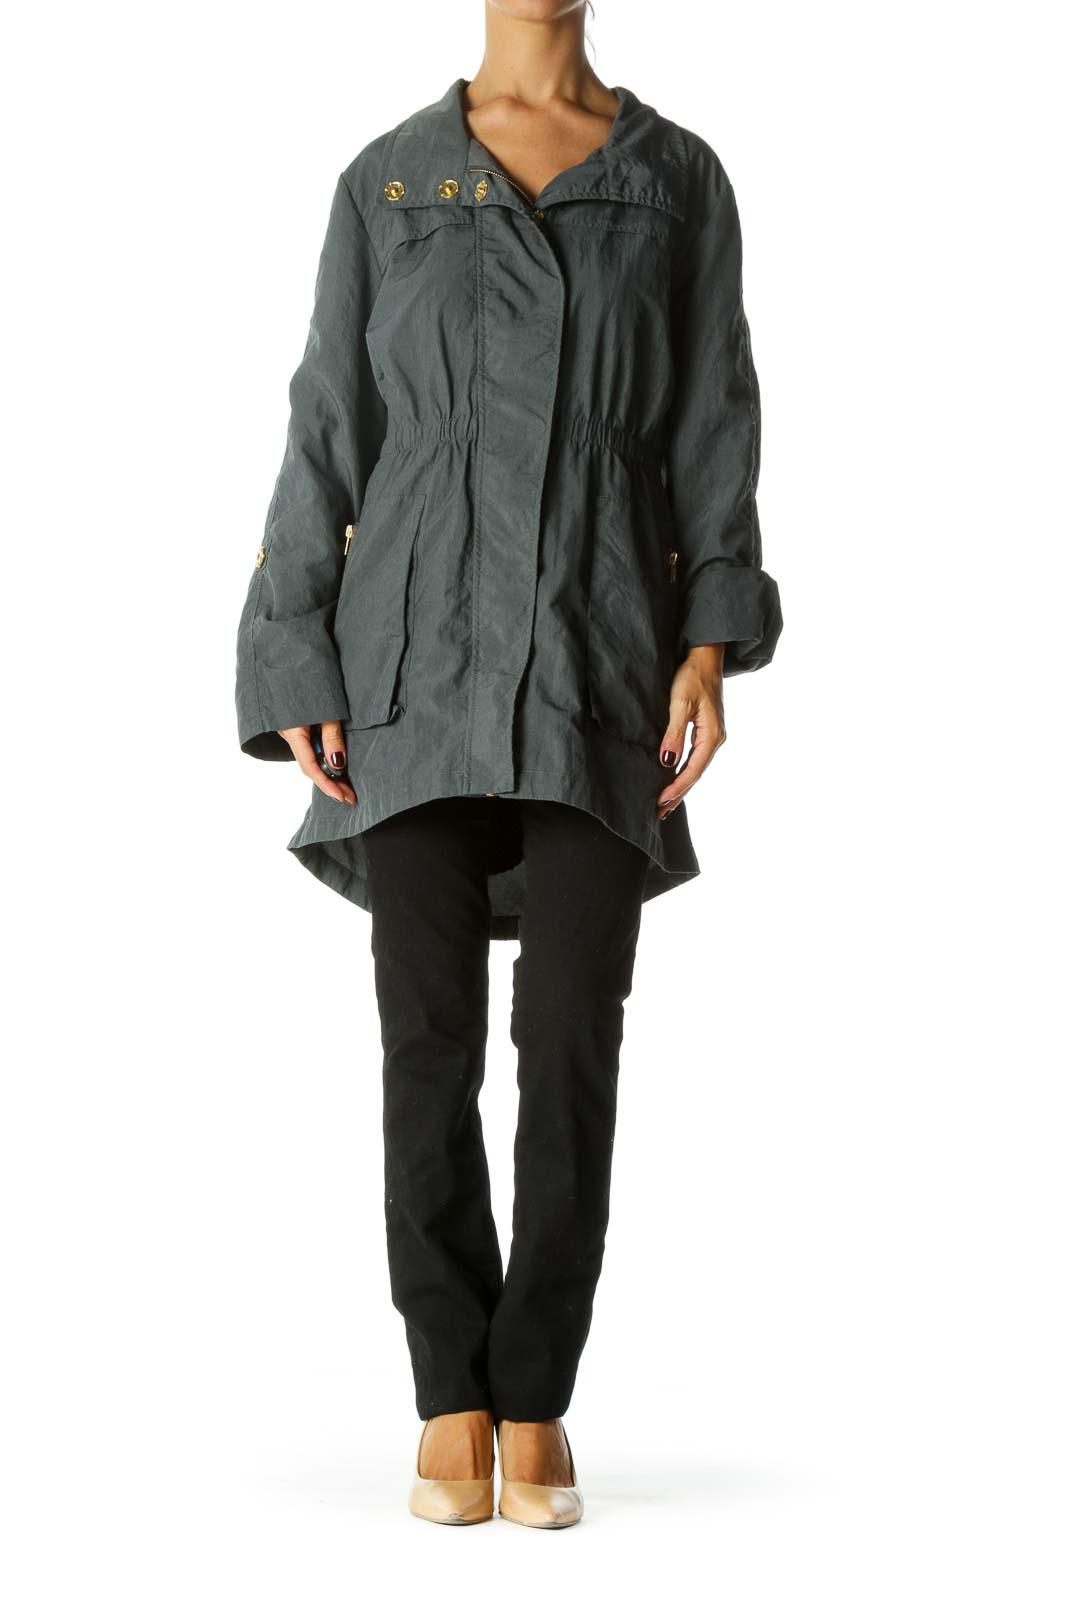 Gray Elastic Waist Long Sleeve Snap Buttons Zippered Jacket